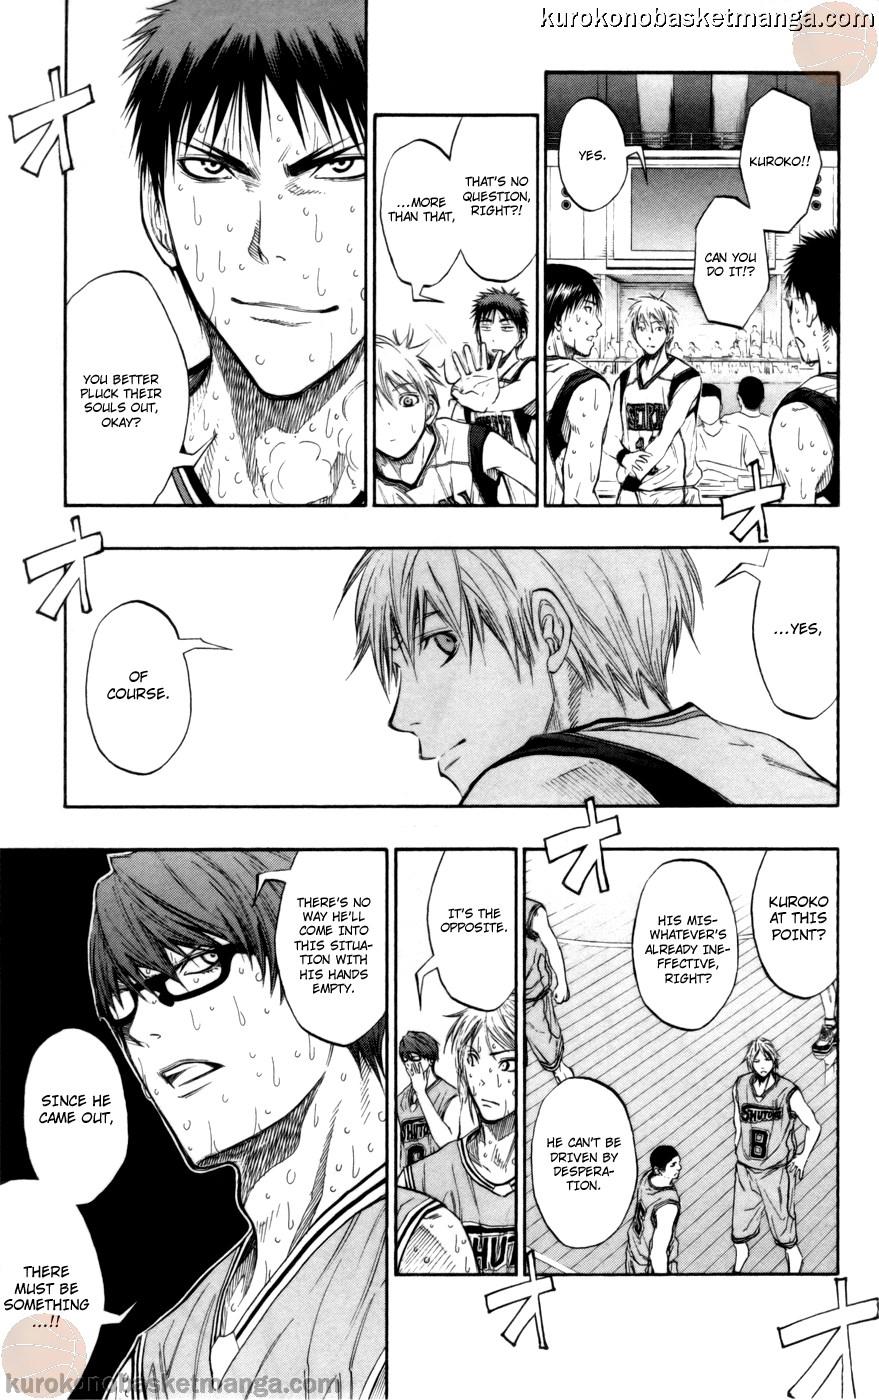 Kuroko no Basket Manga Chapter 90 - Image 06